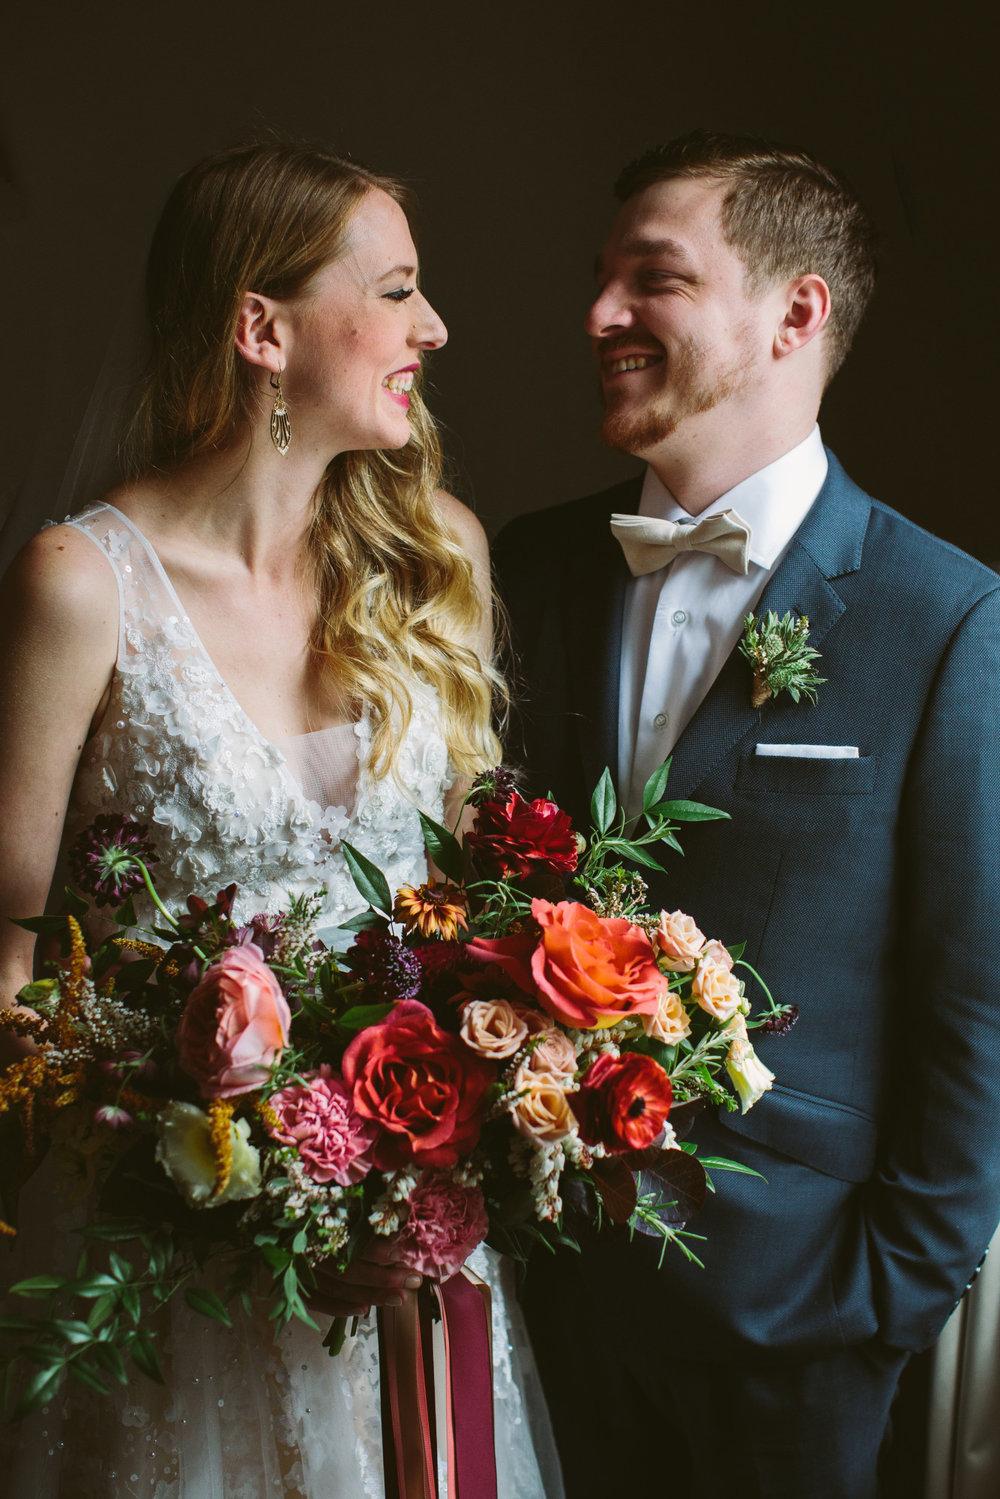 Beth-Ted-Balzacs-Coffee-Distillery-District-Toronto-Wedding-Planning-INLY-Events-Lushana-Bale-Photography-051.jpg